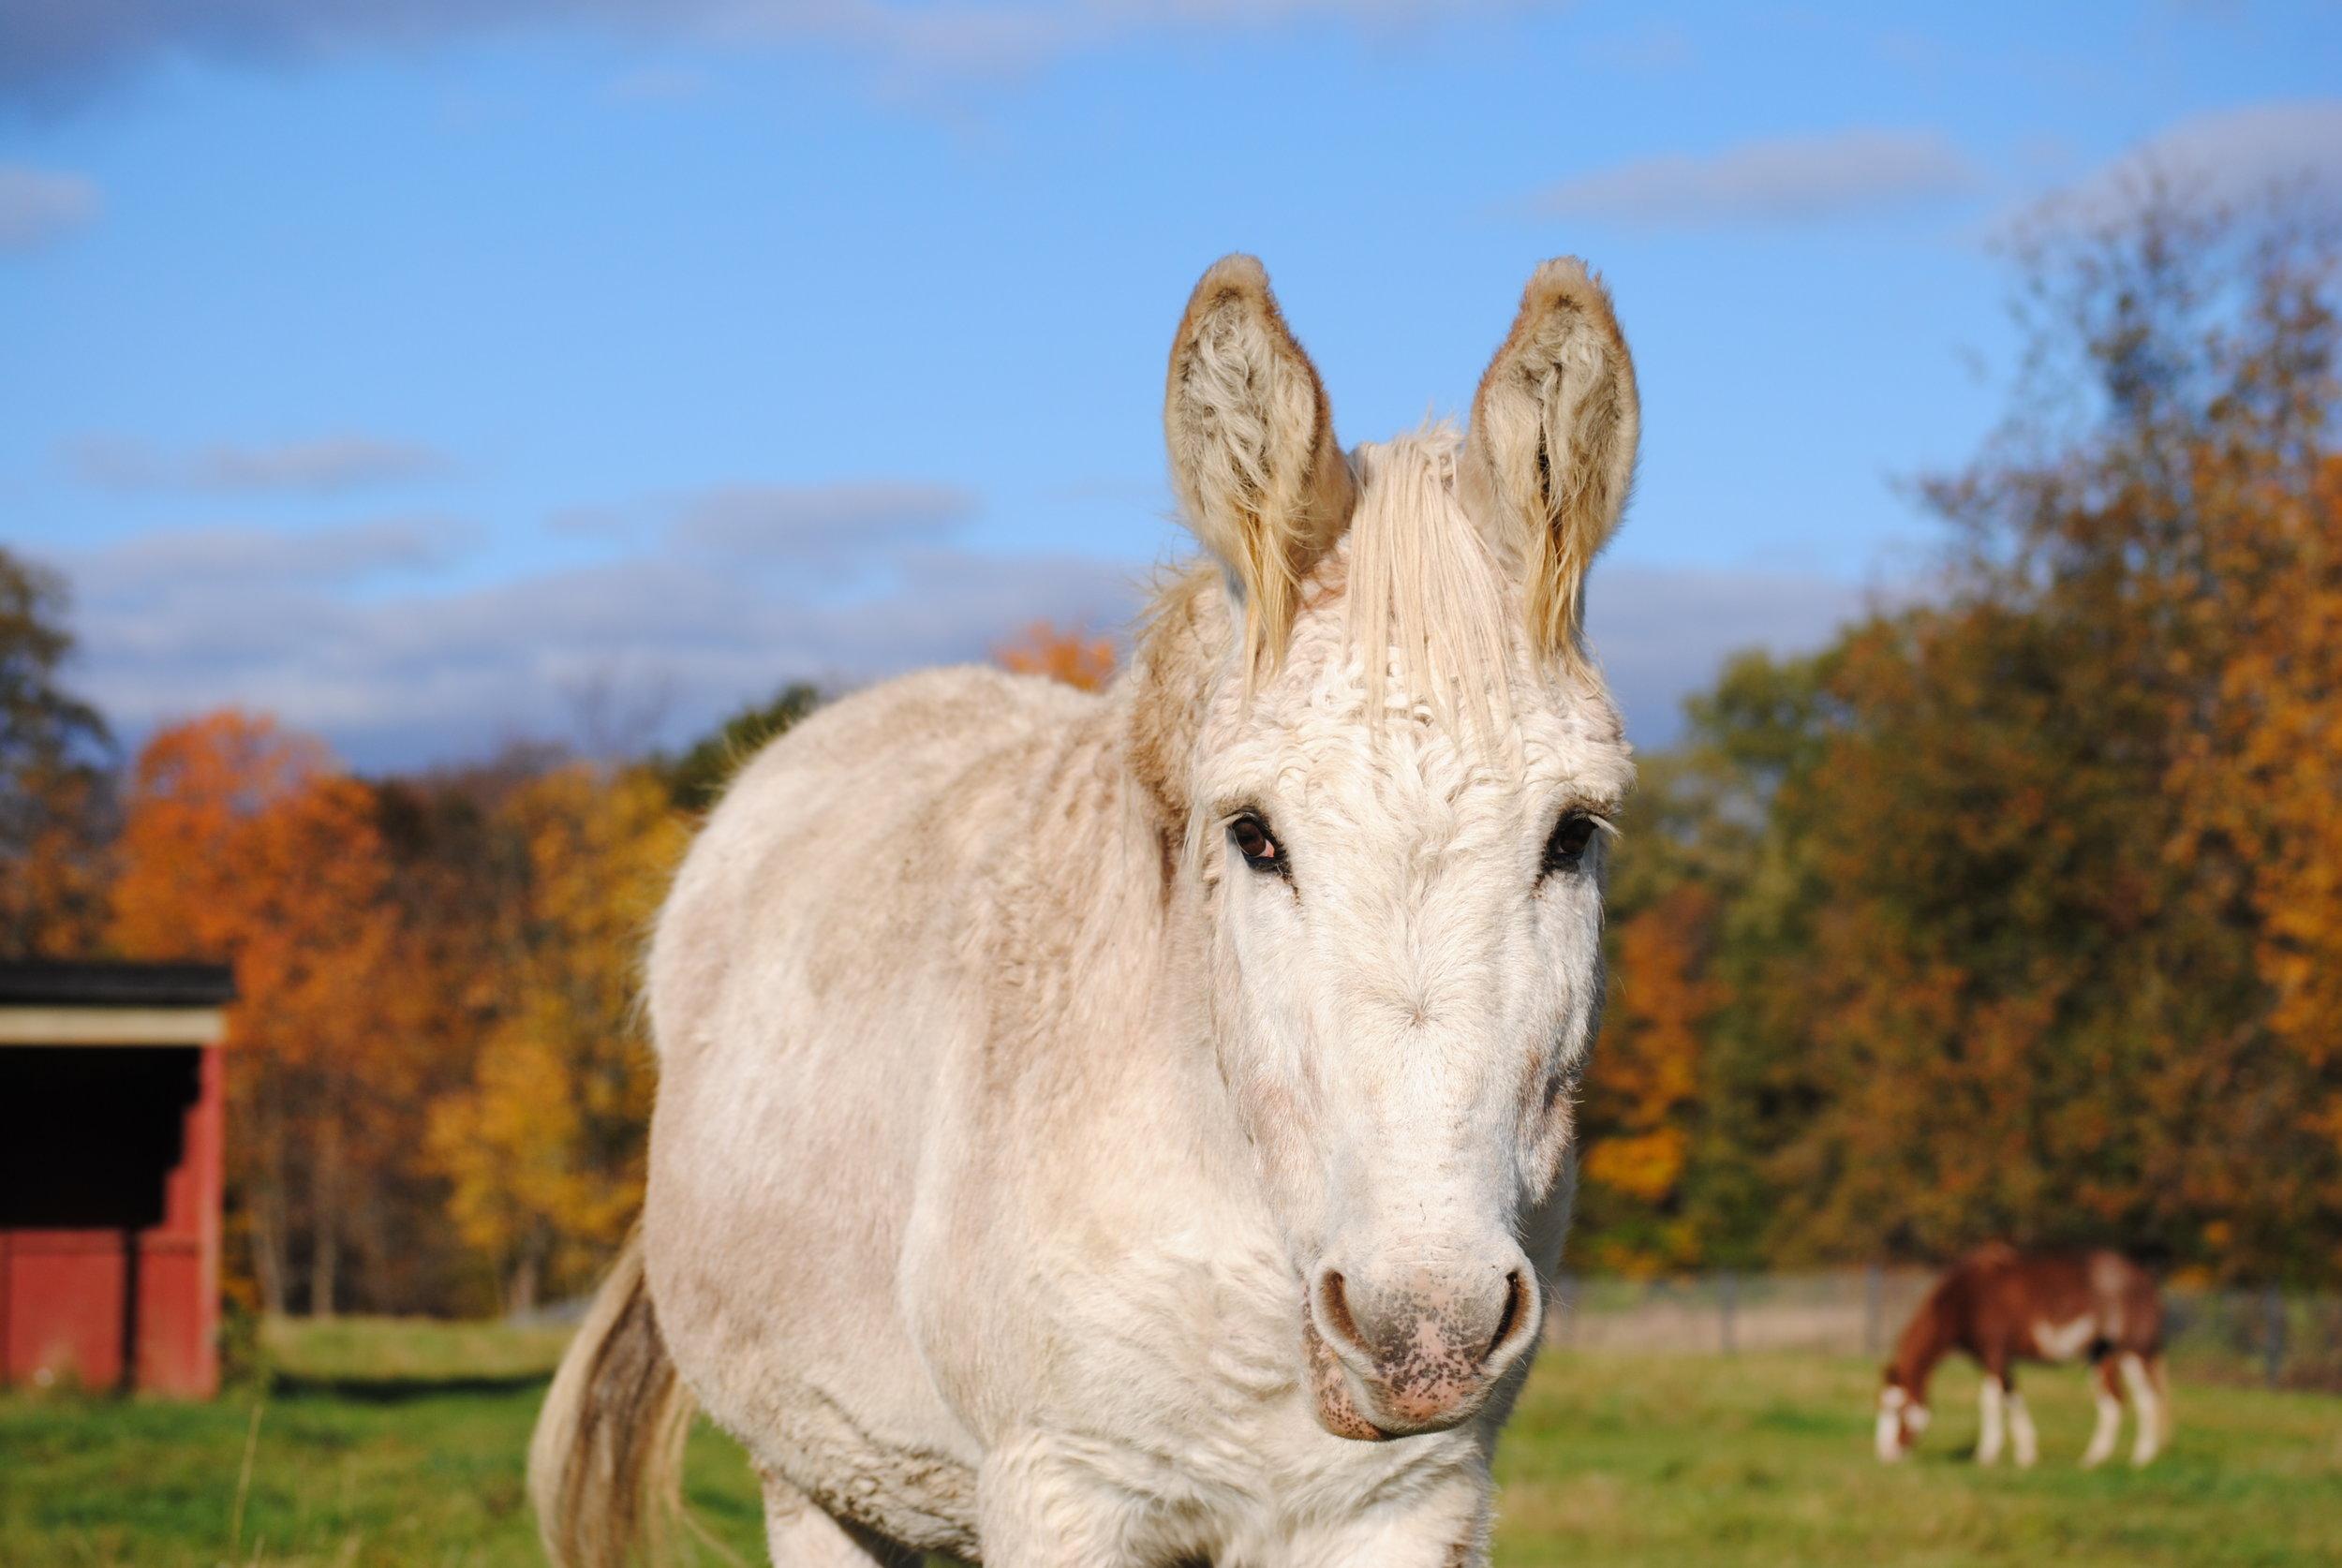 Archie 2006 Standard Donkey Jack Donated By: Stacey Pennock